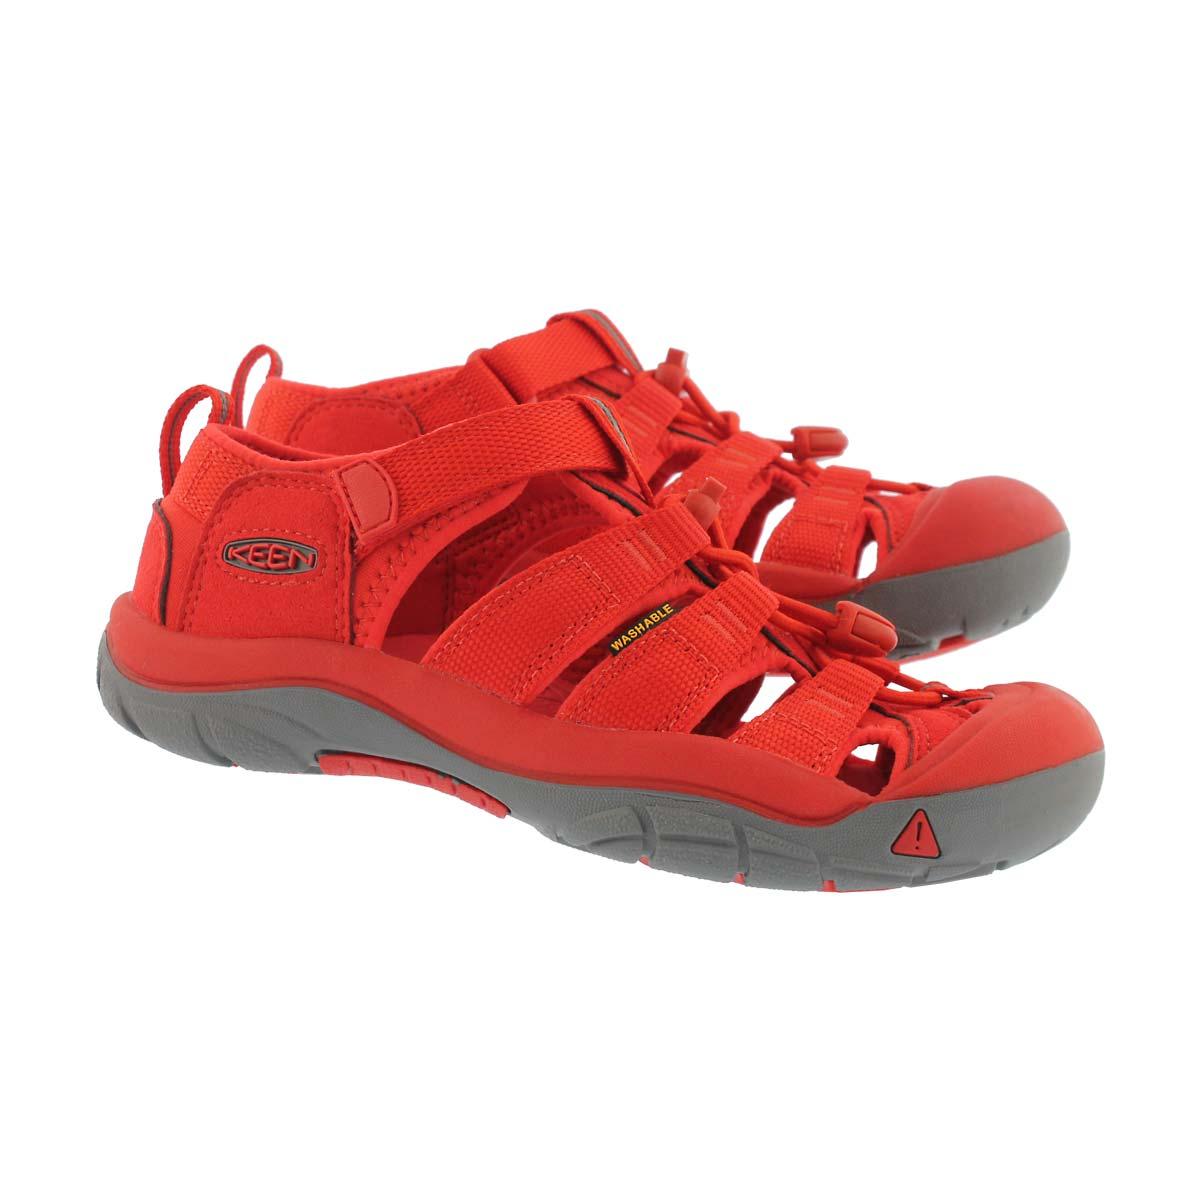 Kds Newport H2 firey red sandal